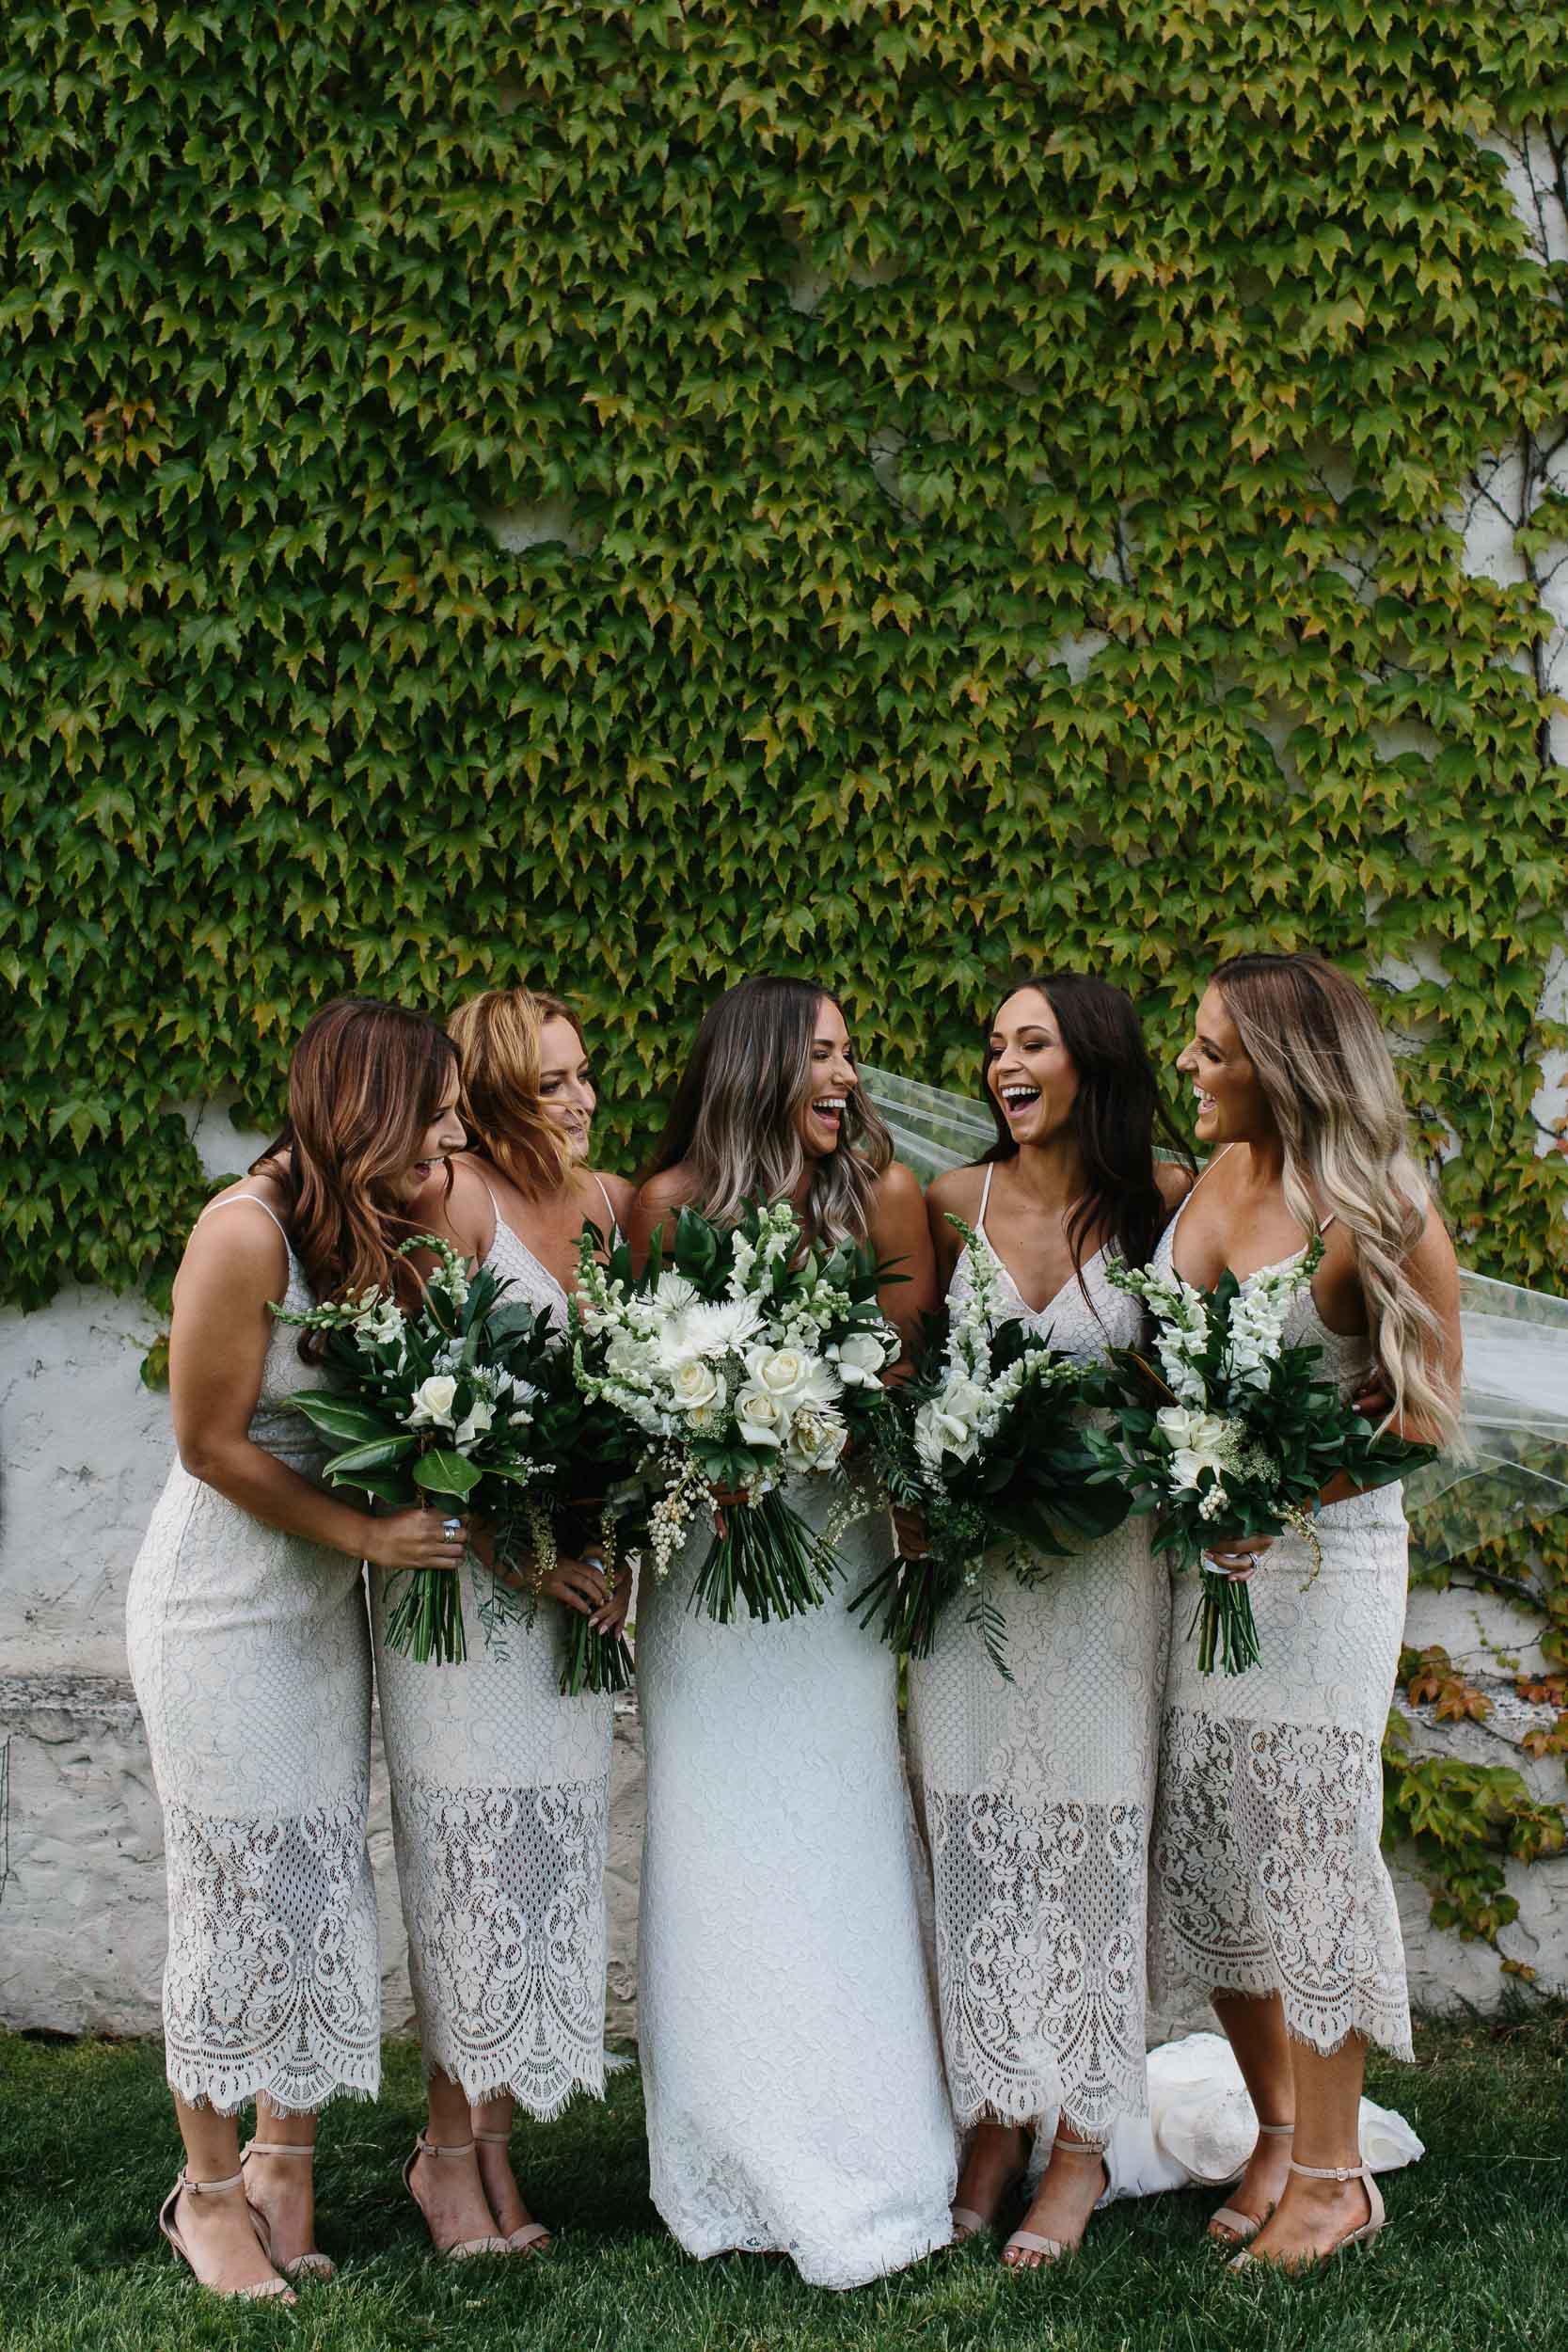 Kas-Richards-Stones-of-the-Yarra-Valley-Wedding-534.jpg